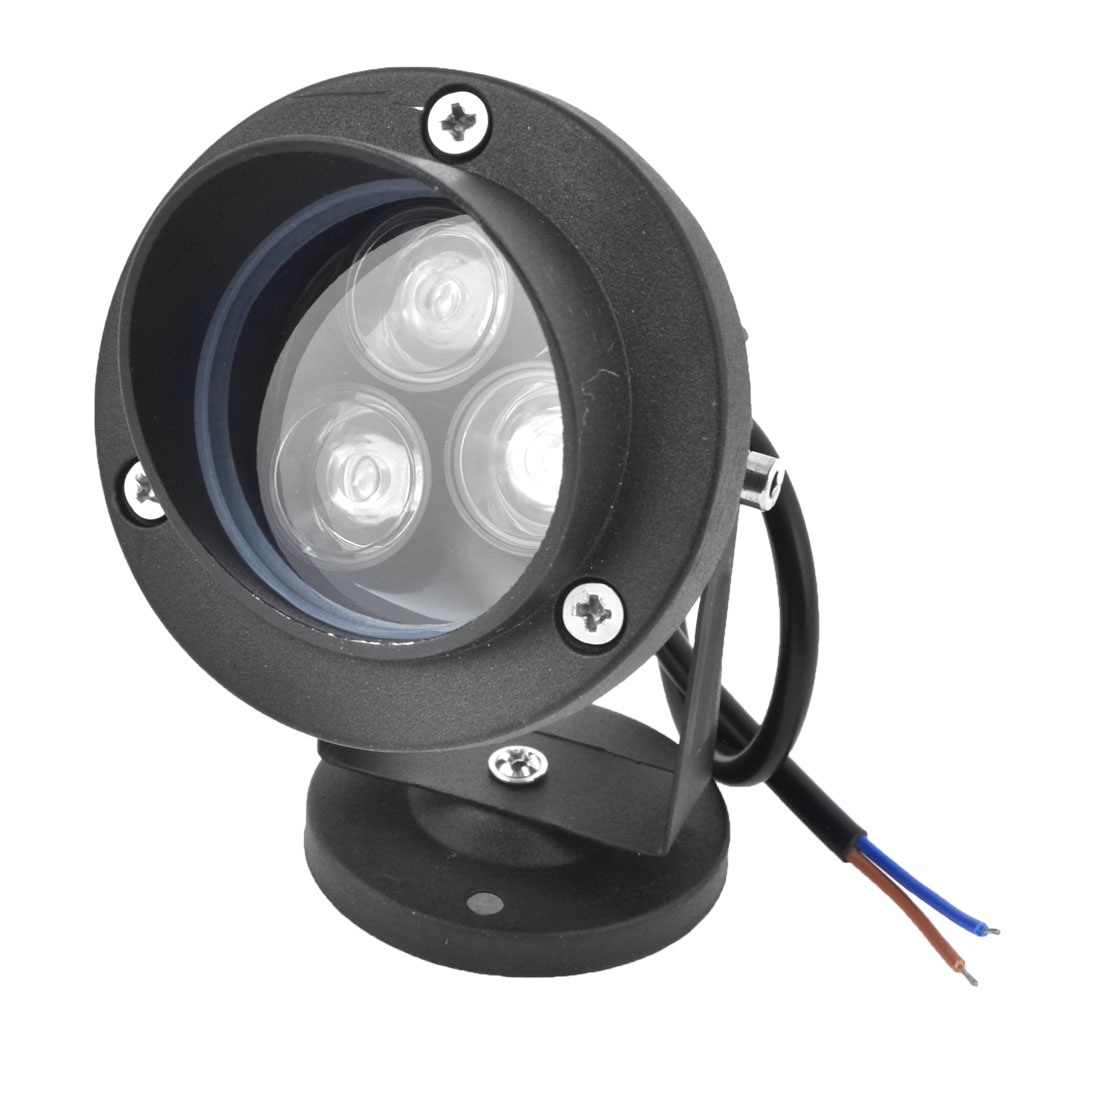 12V 6W Green 300-330LM 3-LEDs Light Outdoor Yard Lawn Lamp Spotlight